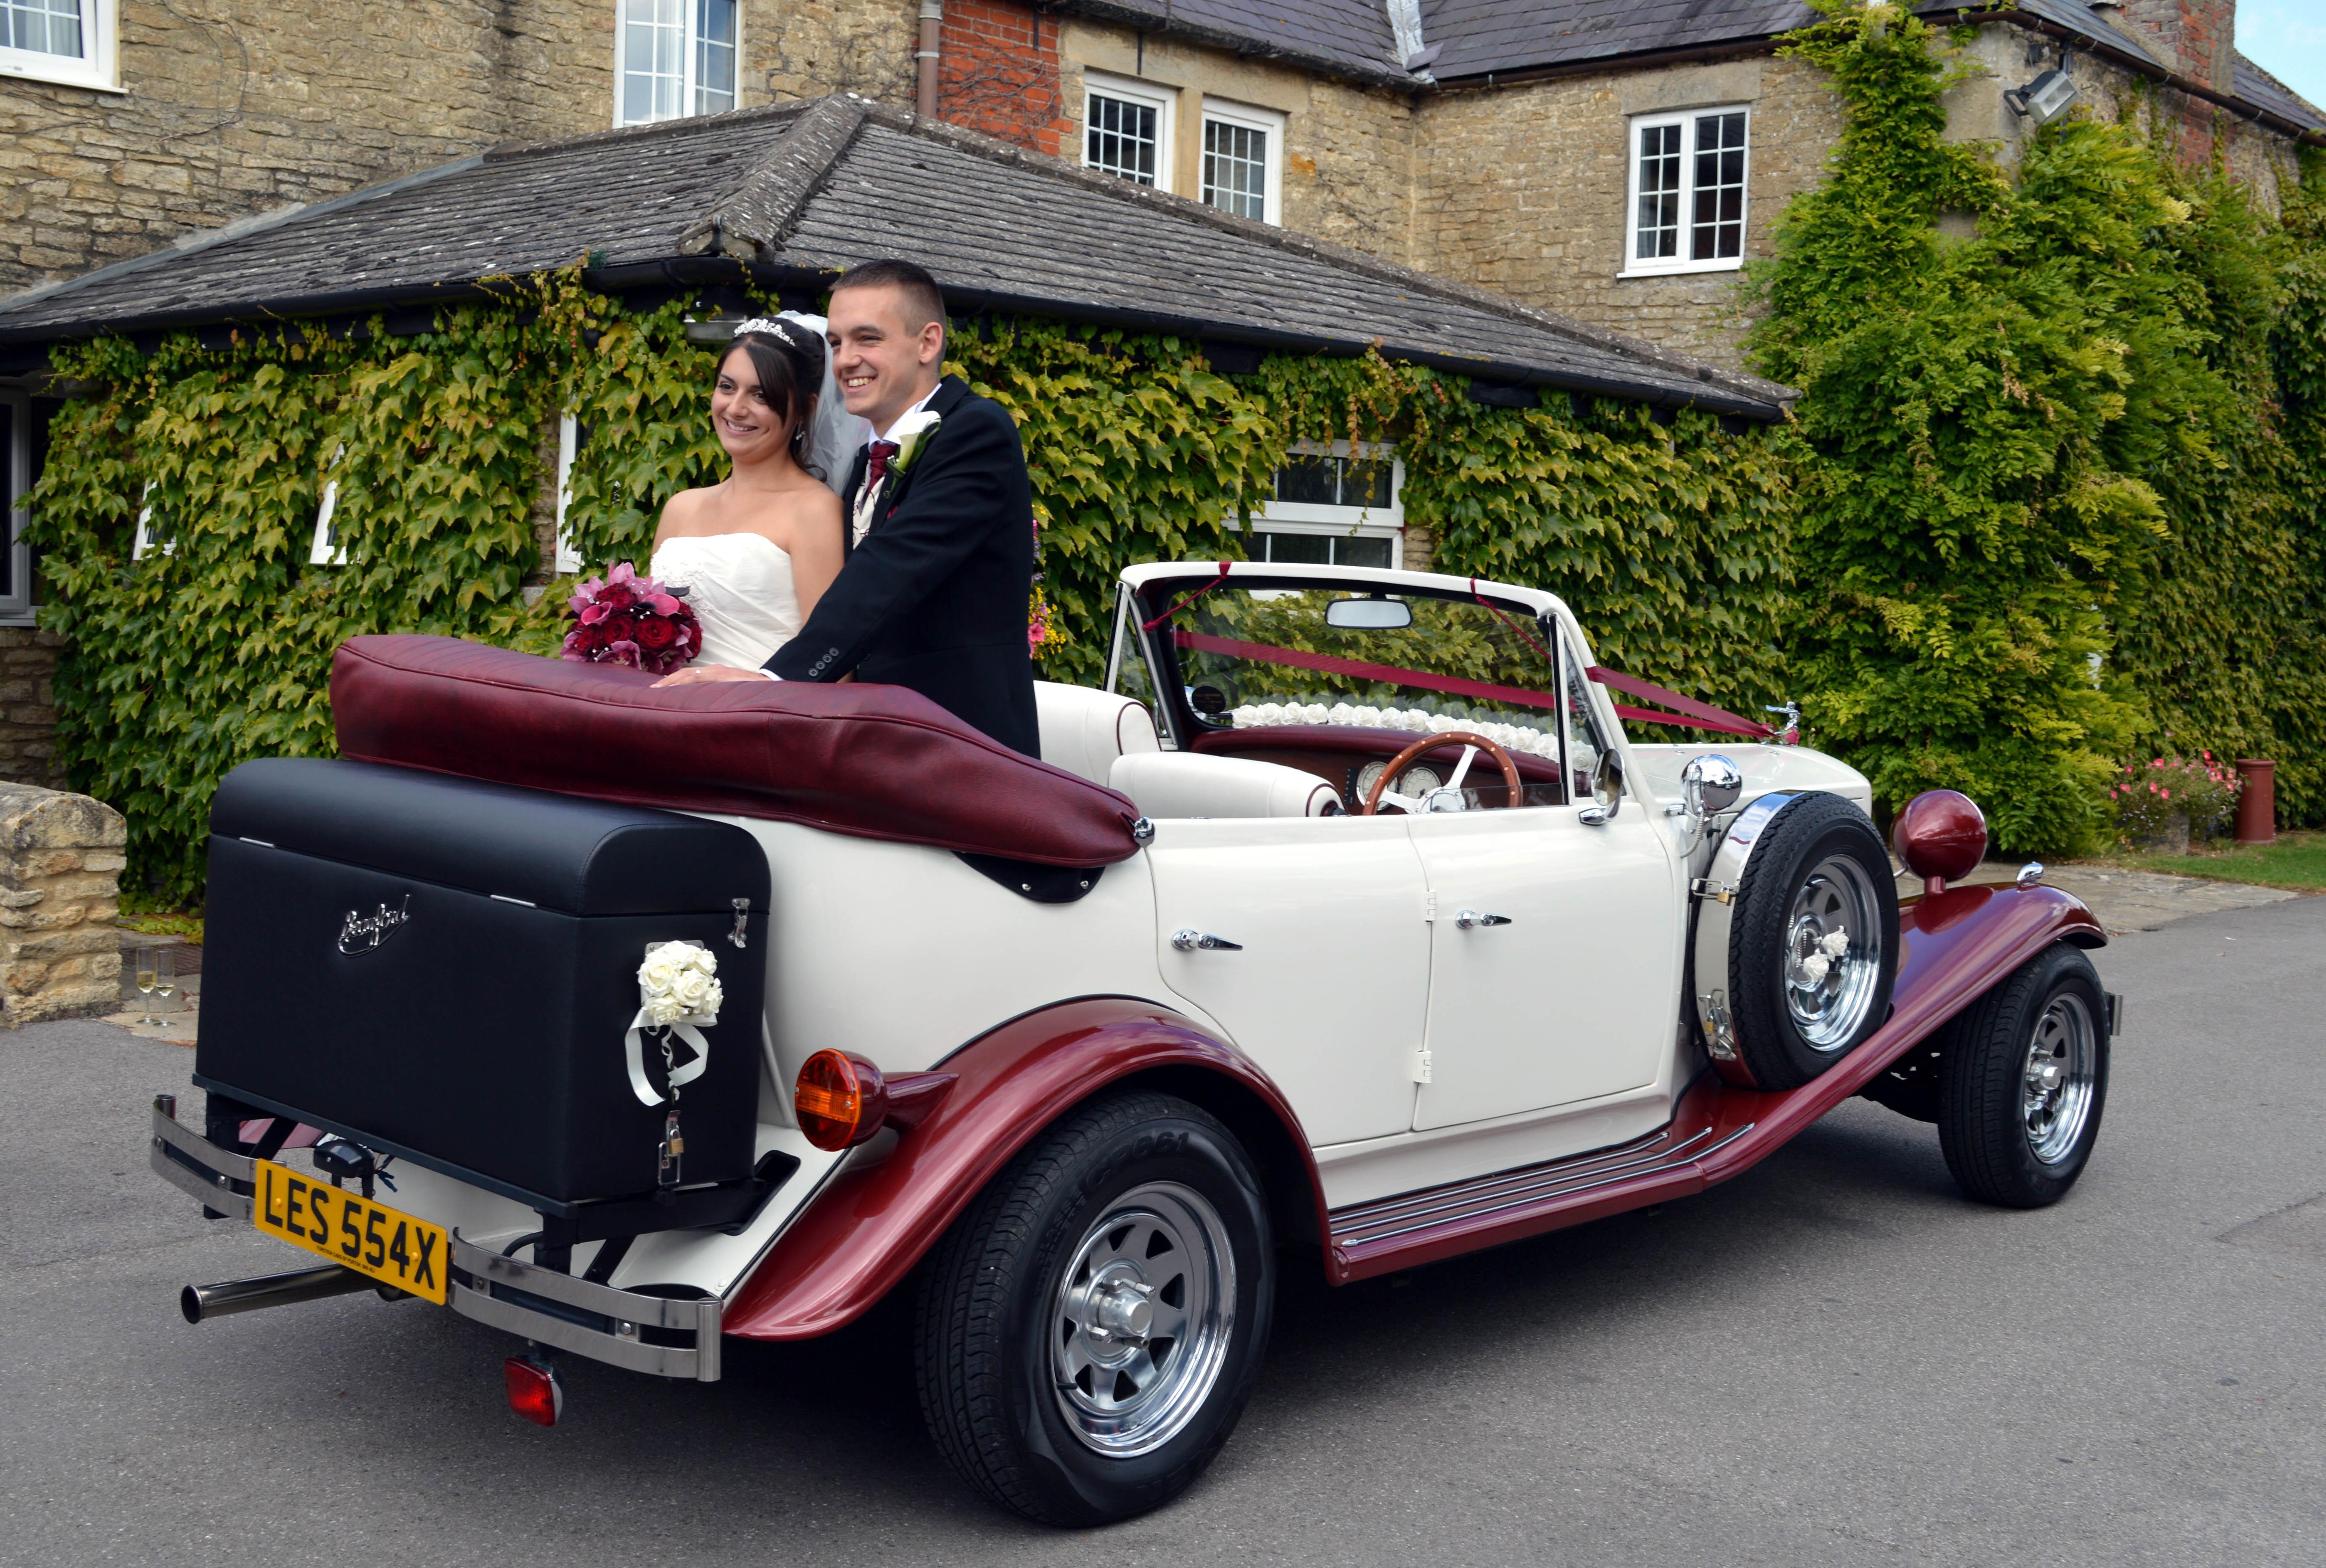 Luxury Vehicle: White Wedding Car Wedding Car Hire Near Swindon, Wiltshire